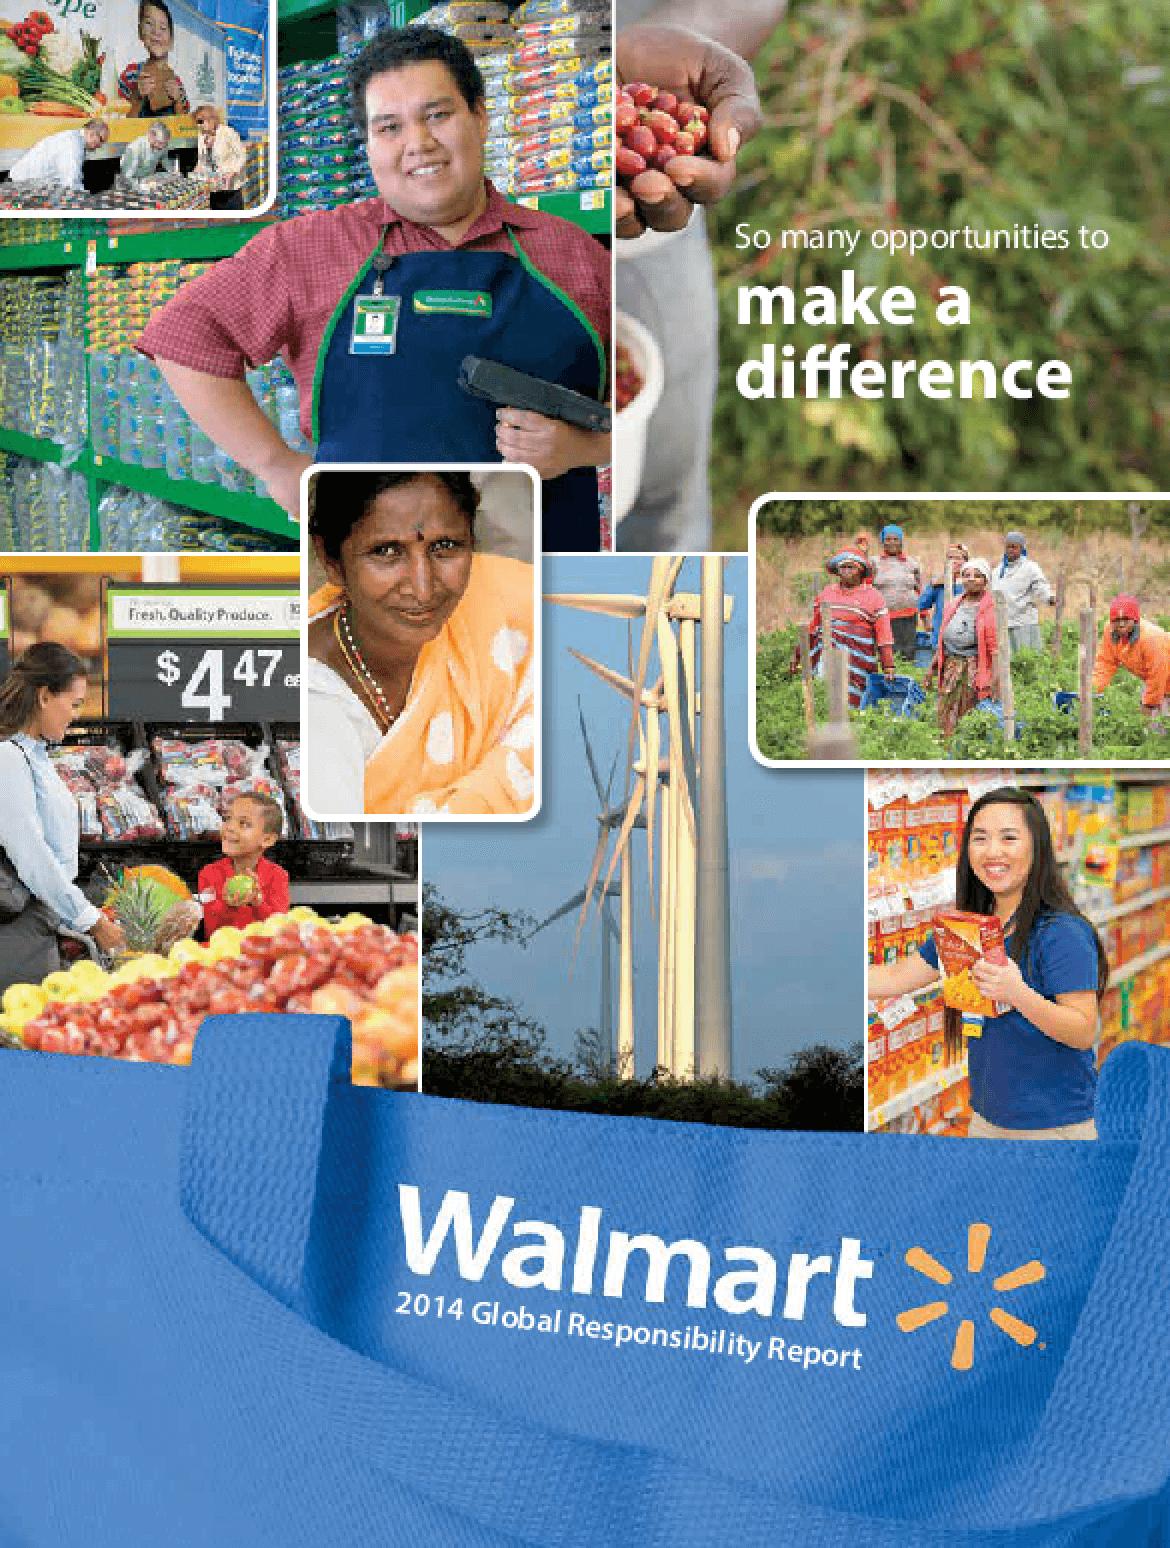 Walmart 2014 Global Responsibility Report